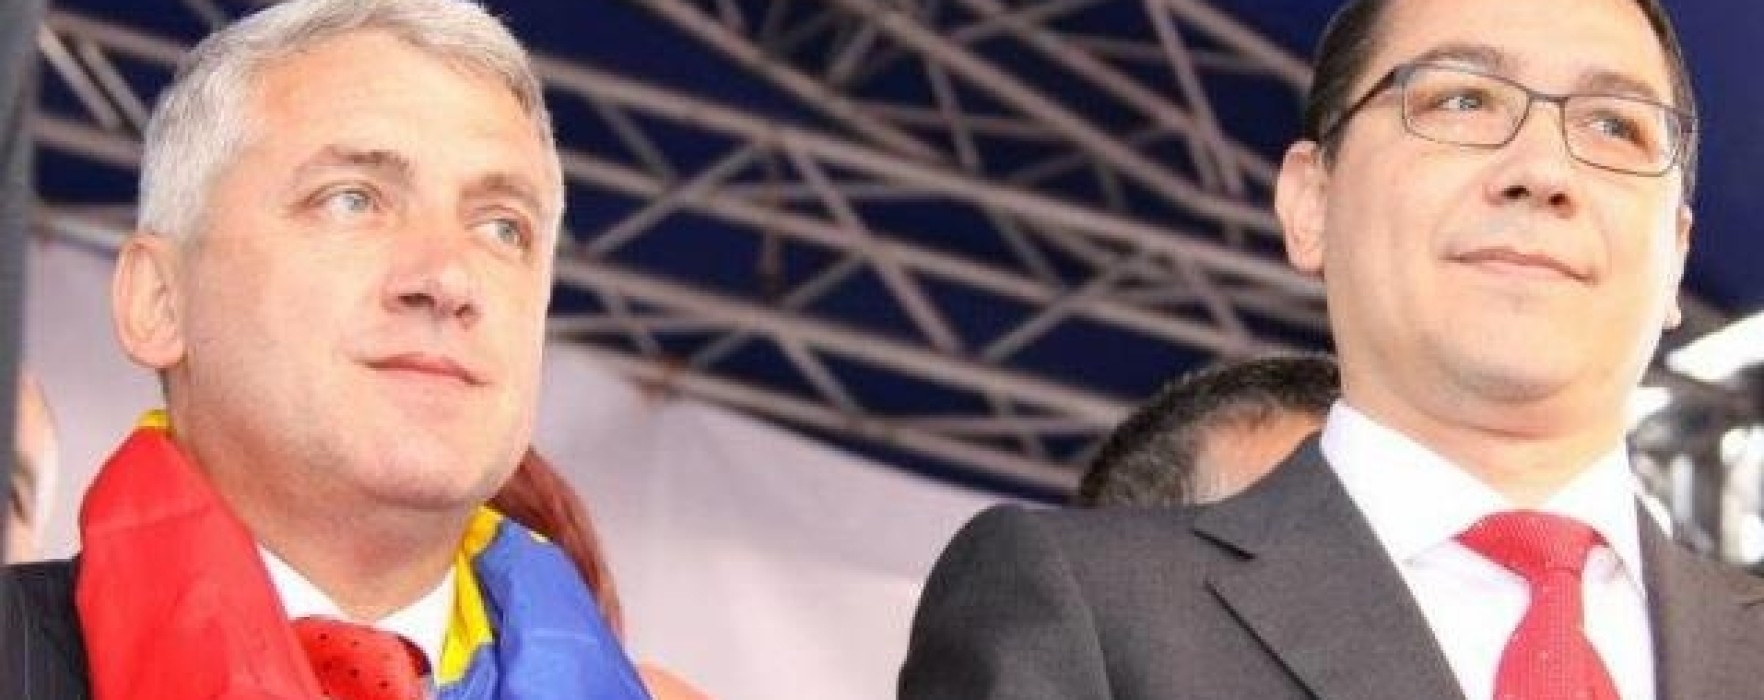 Victor Ponta se va afla, vineri, în Dâmboviţa